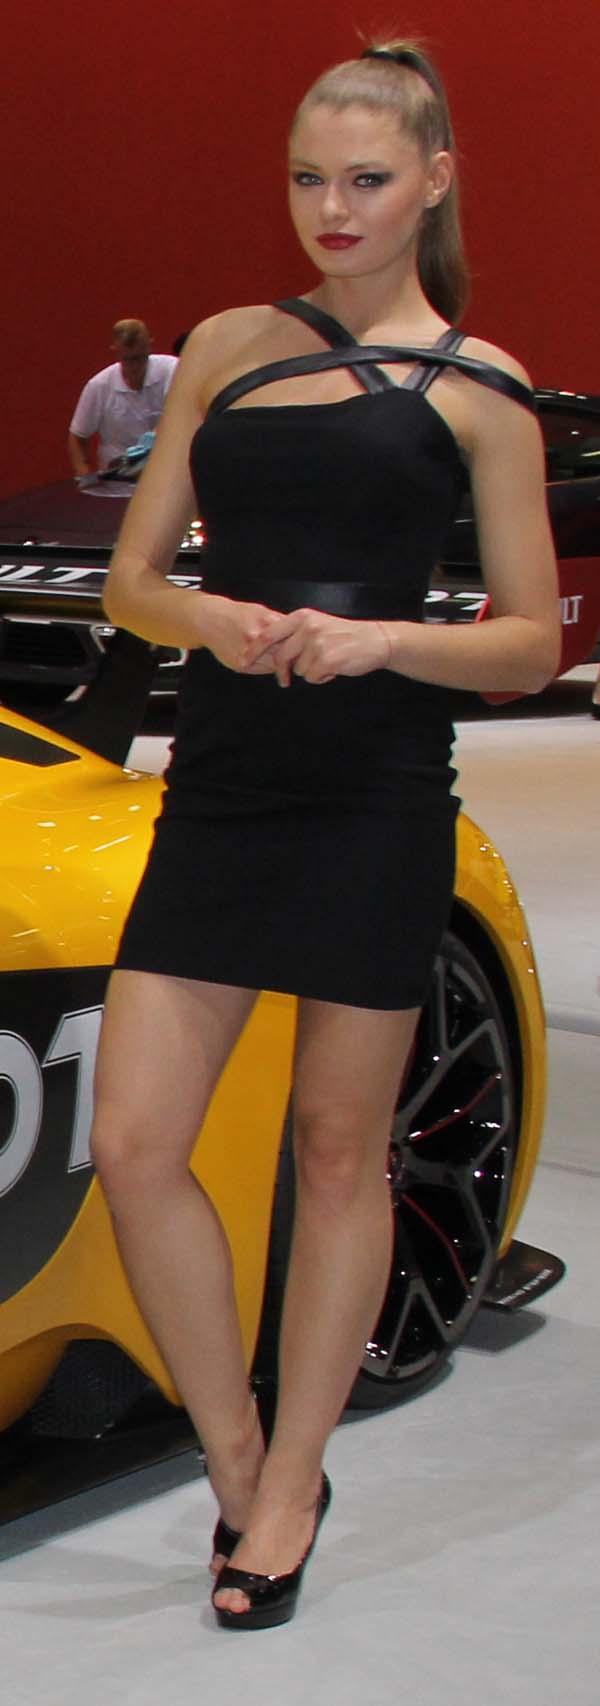 istanbul autoshow 2015 mankenler 18